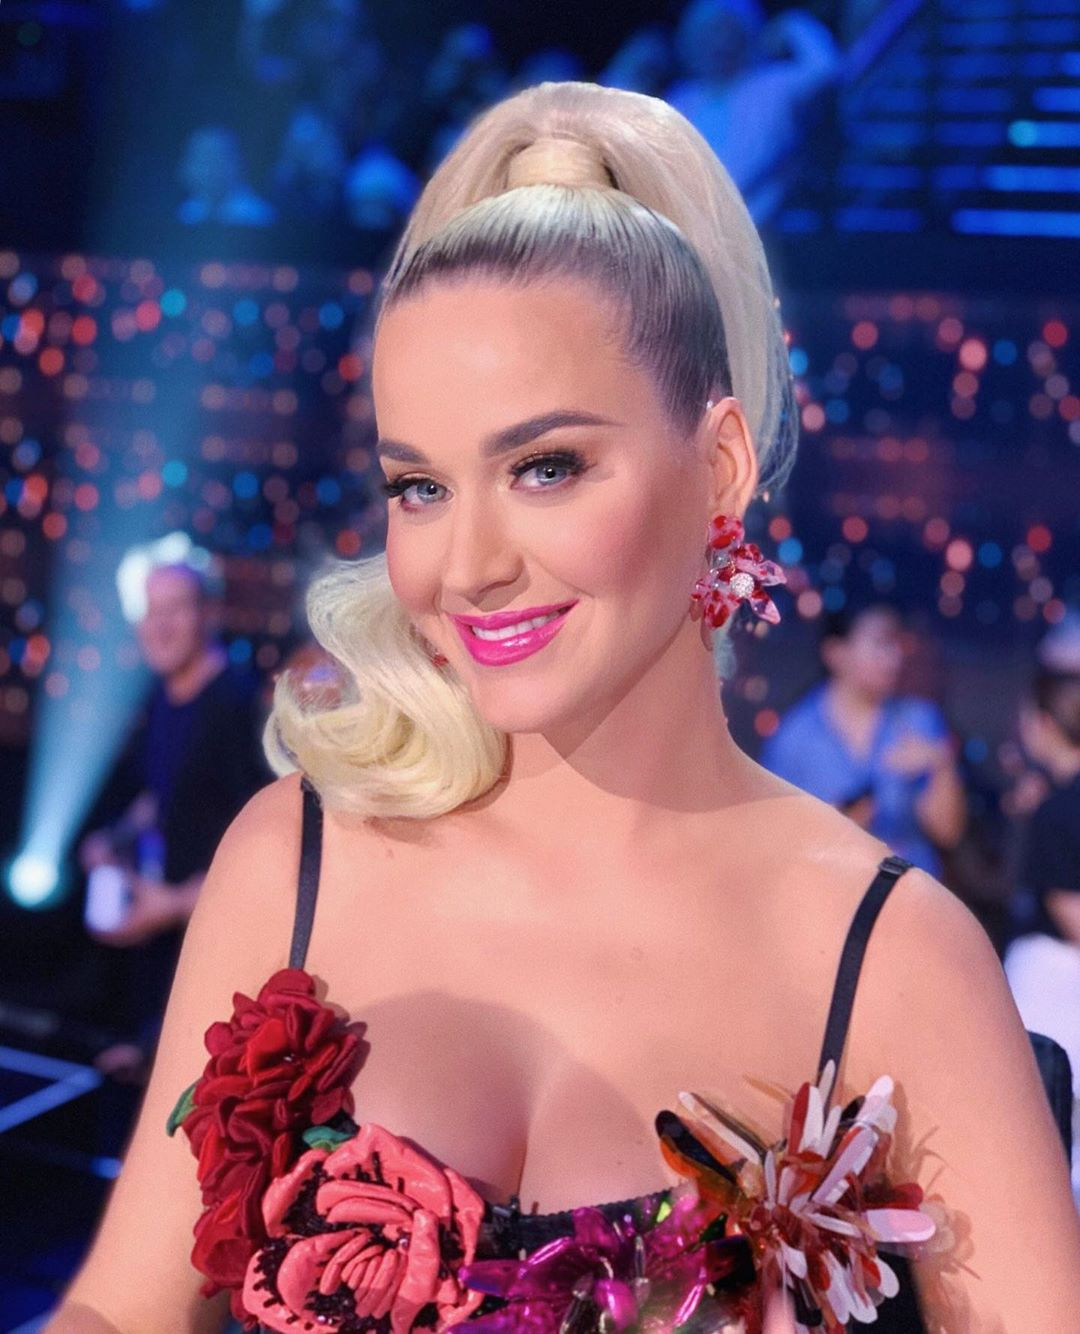 Katy Perry, Zoey Deutch, Sadie Sink: os melhores looks de Beleza da semana